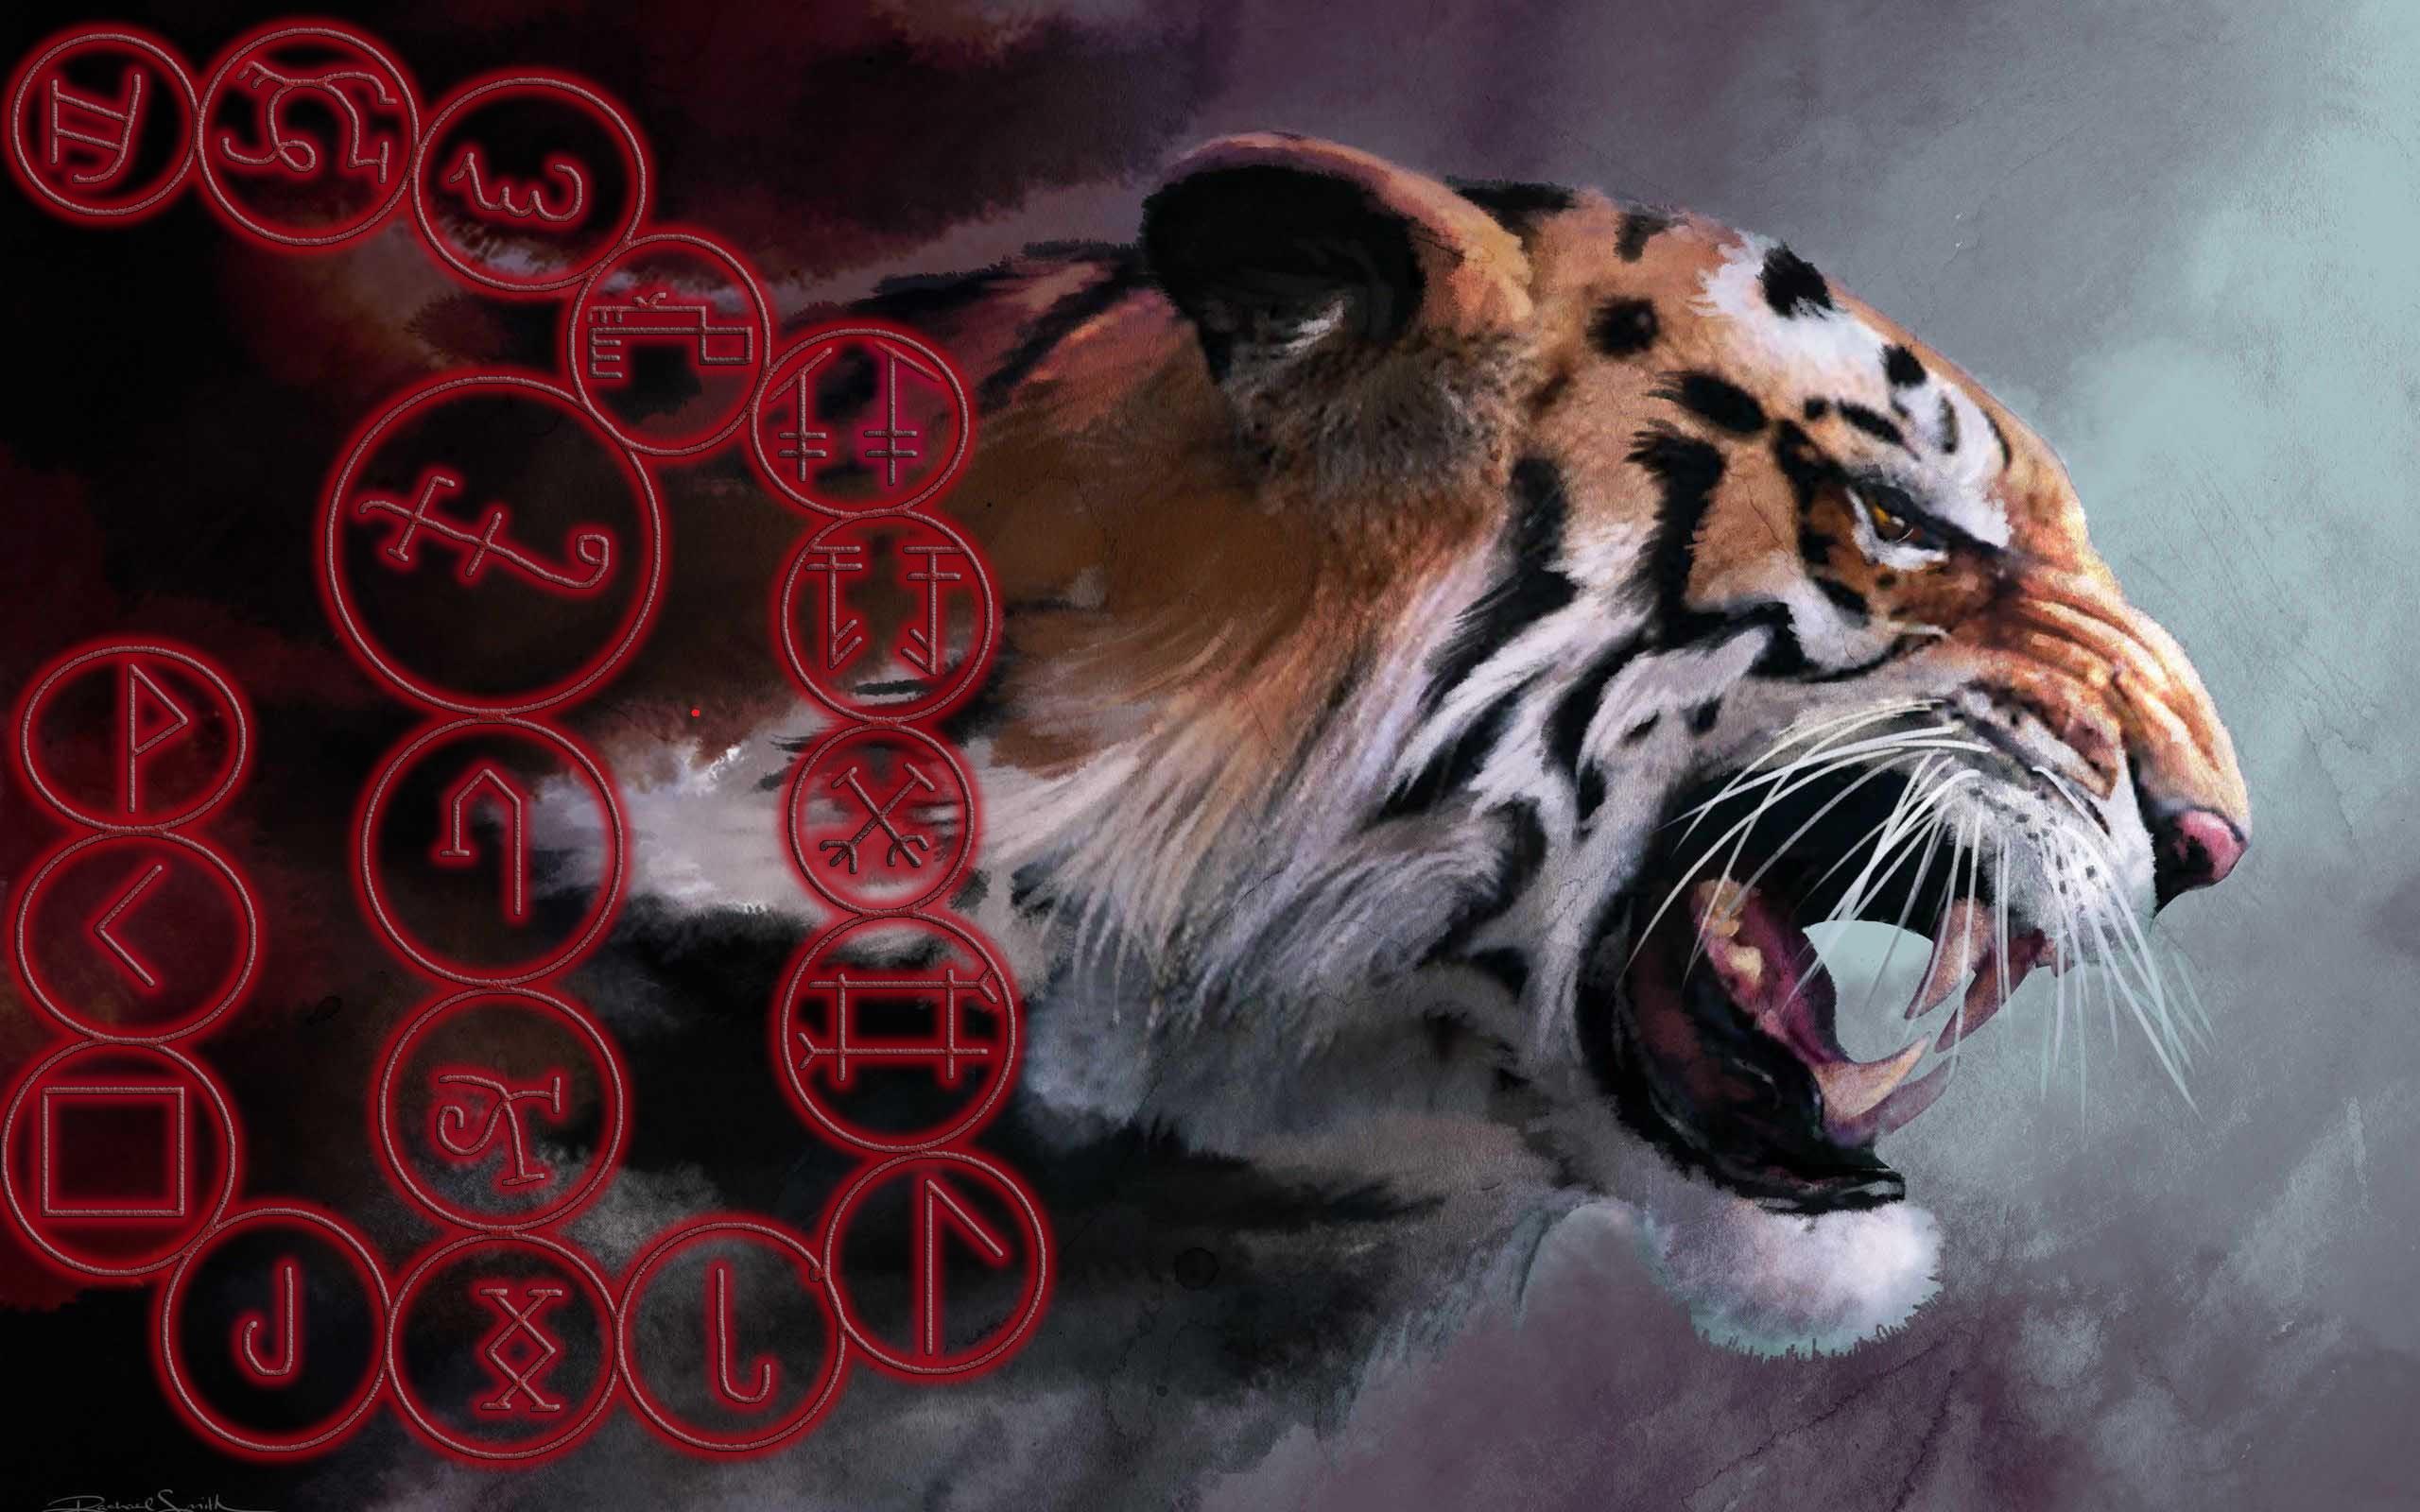 Демон-защитник - призыв демона на защиту 2bMMWjY_AG8